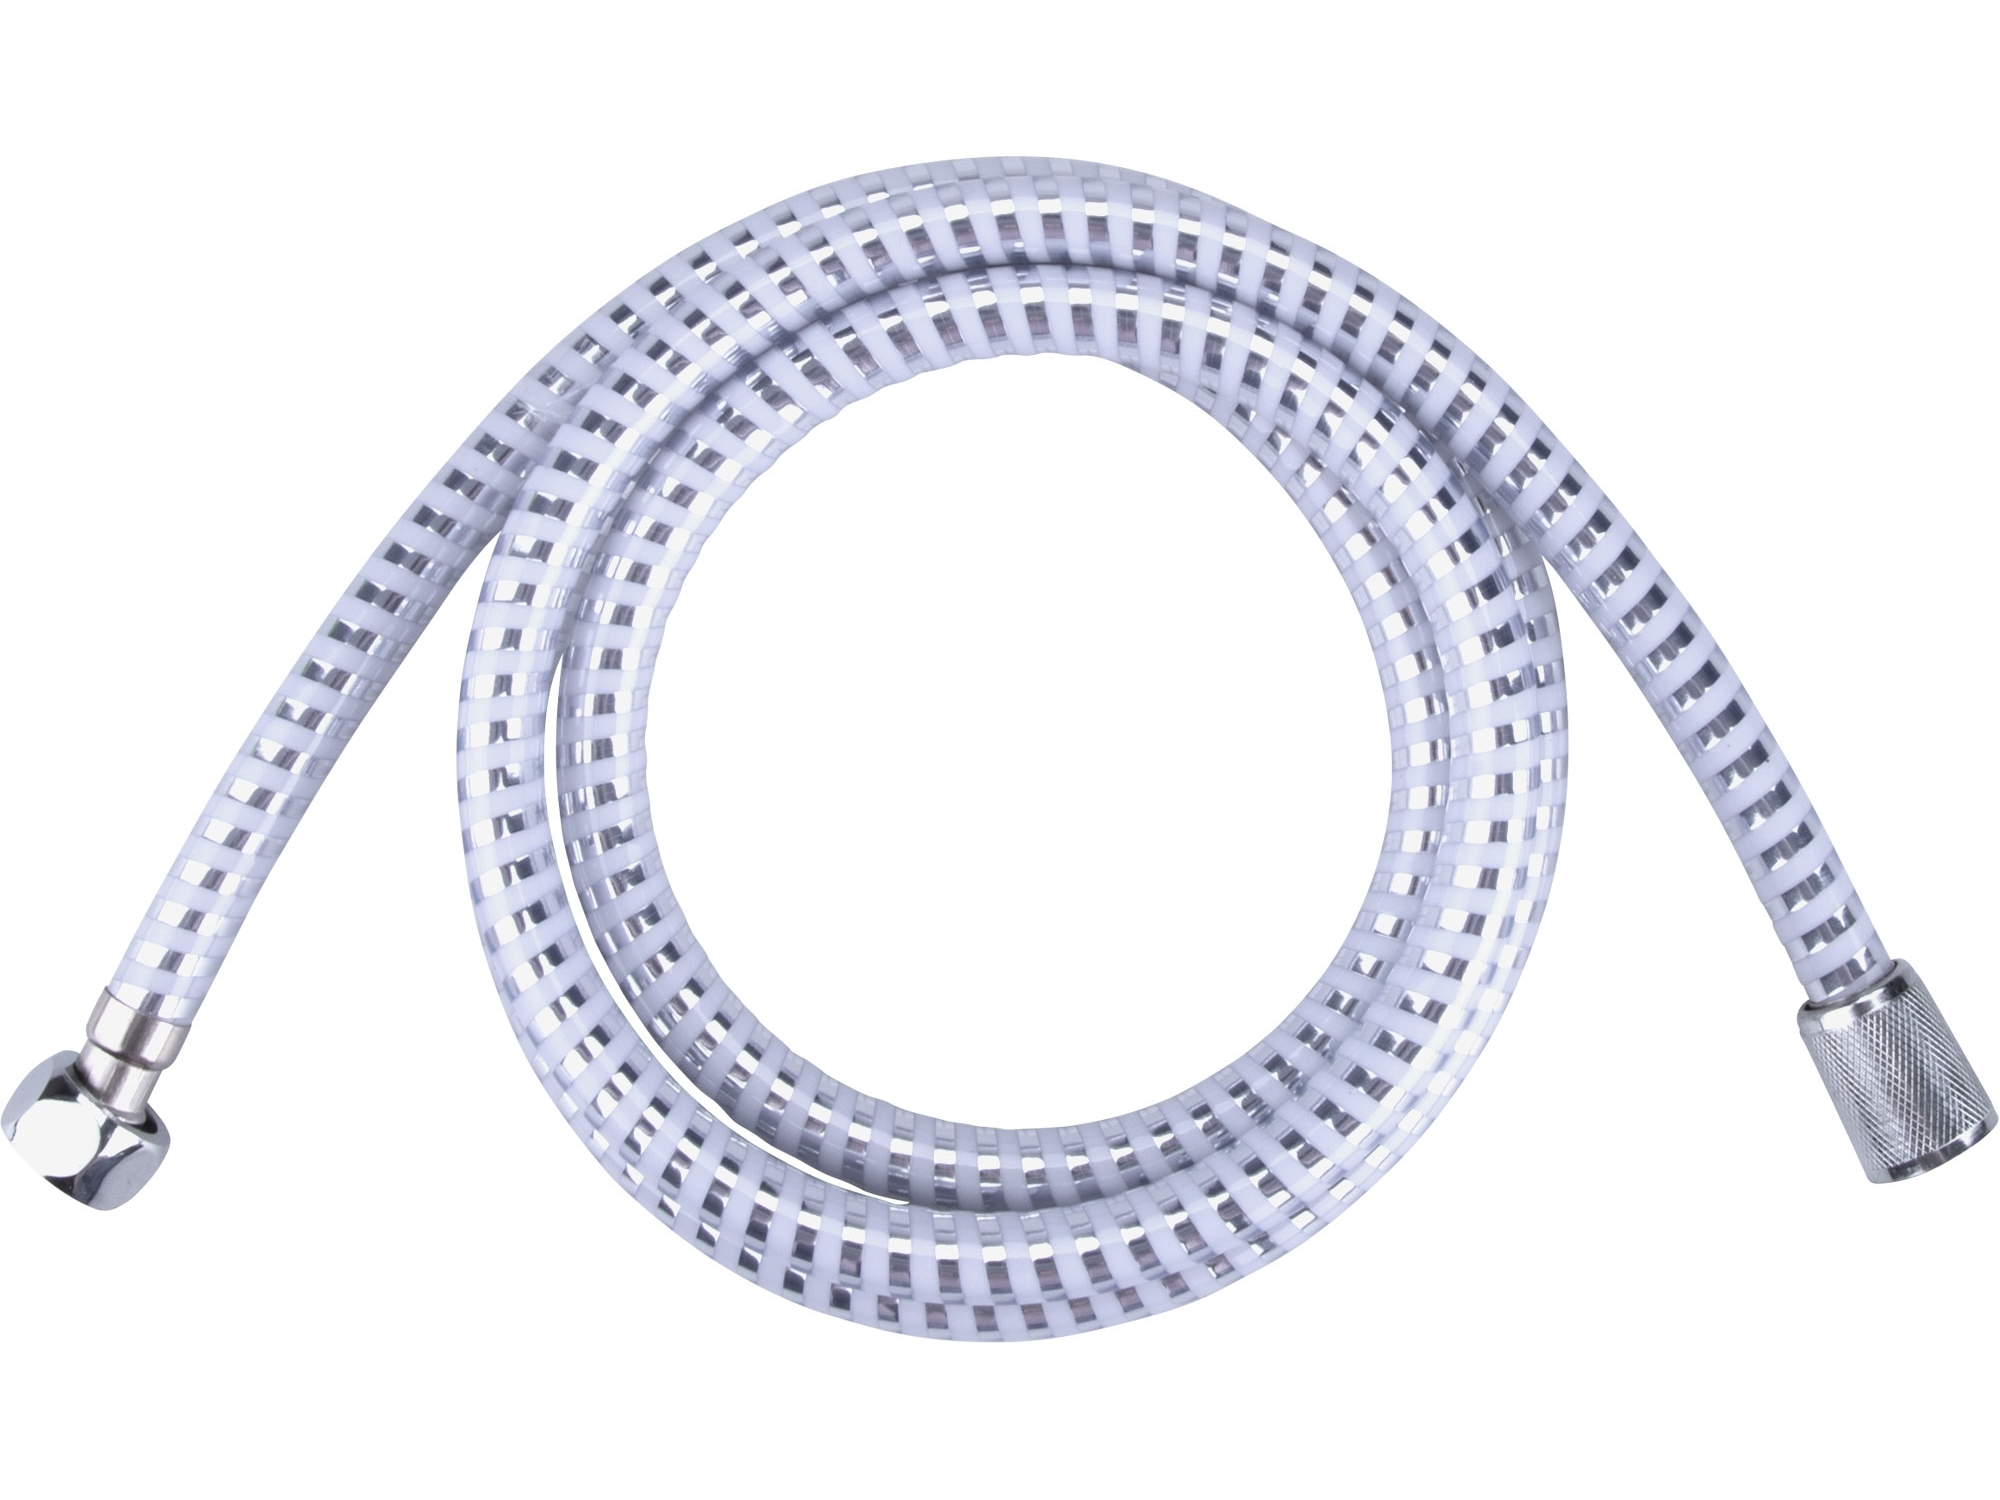 hadice sprchová, stříbrný pruh, 180cm, PVC